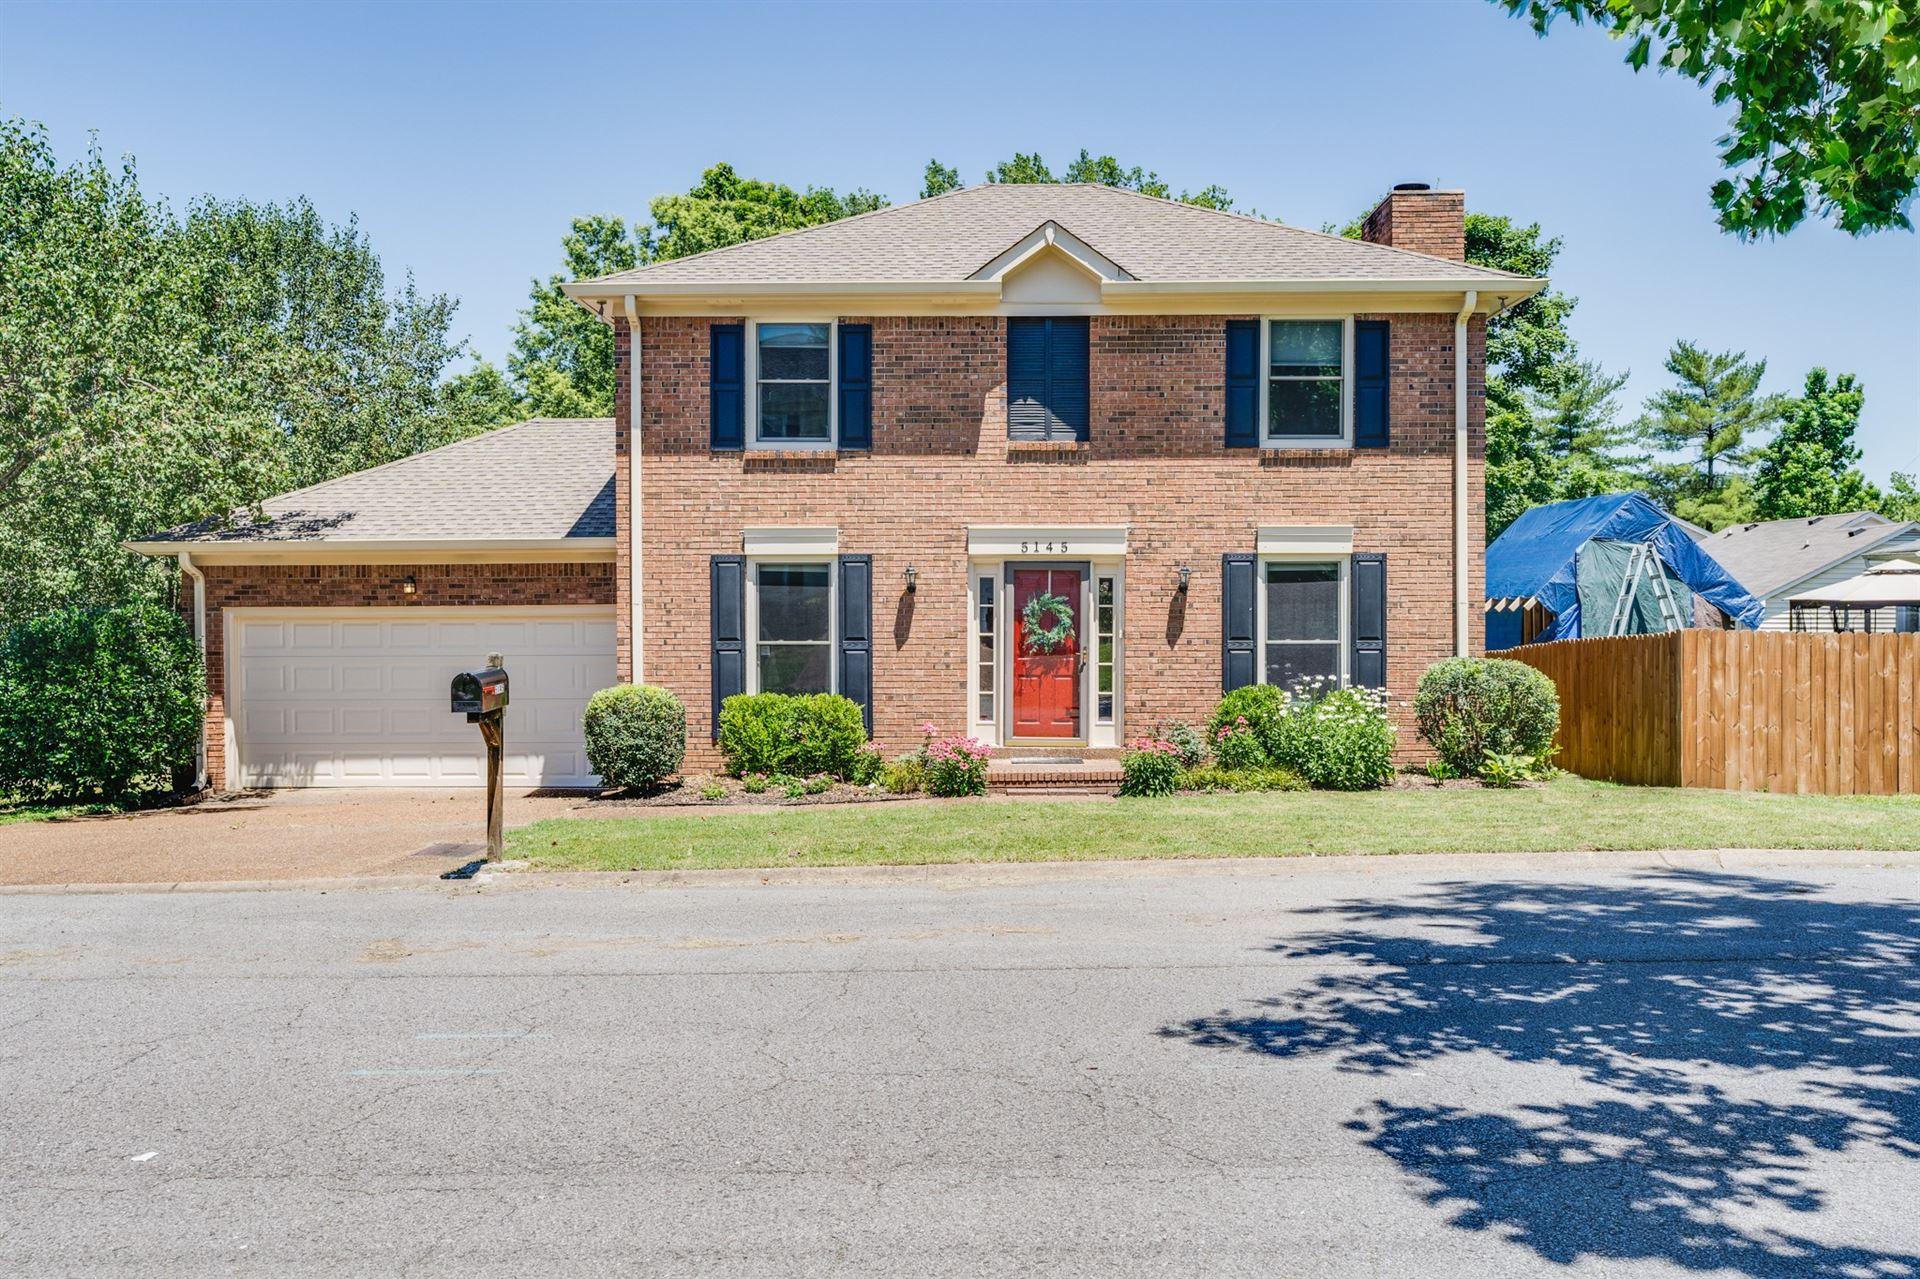 5145 Village Trce, Nashville, TN 37211 - MLS#: 2263377